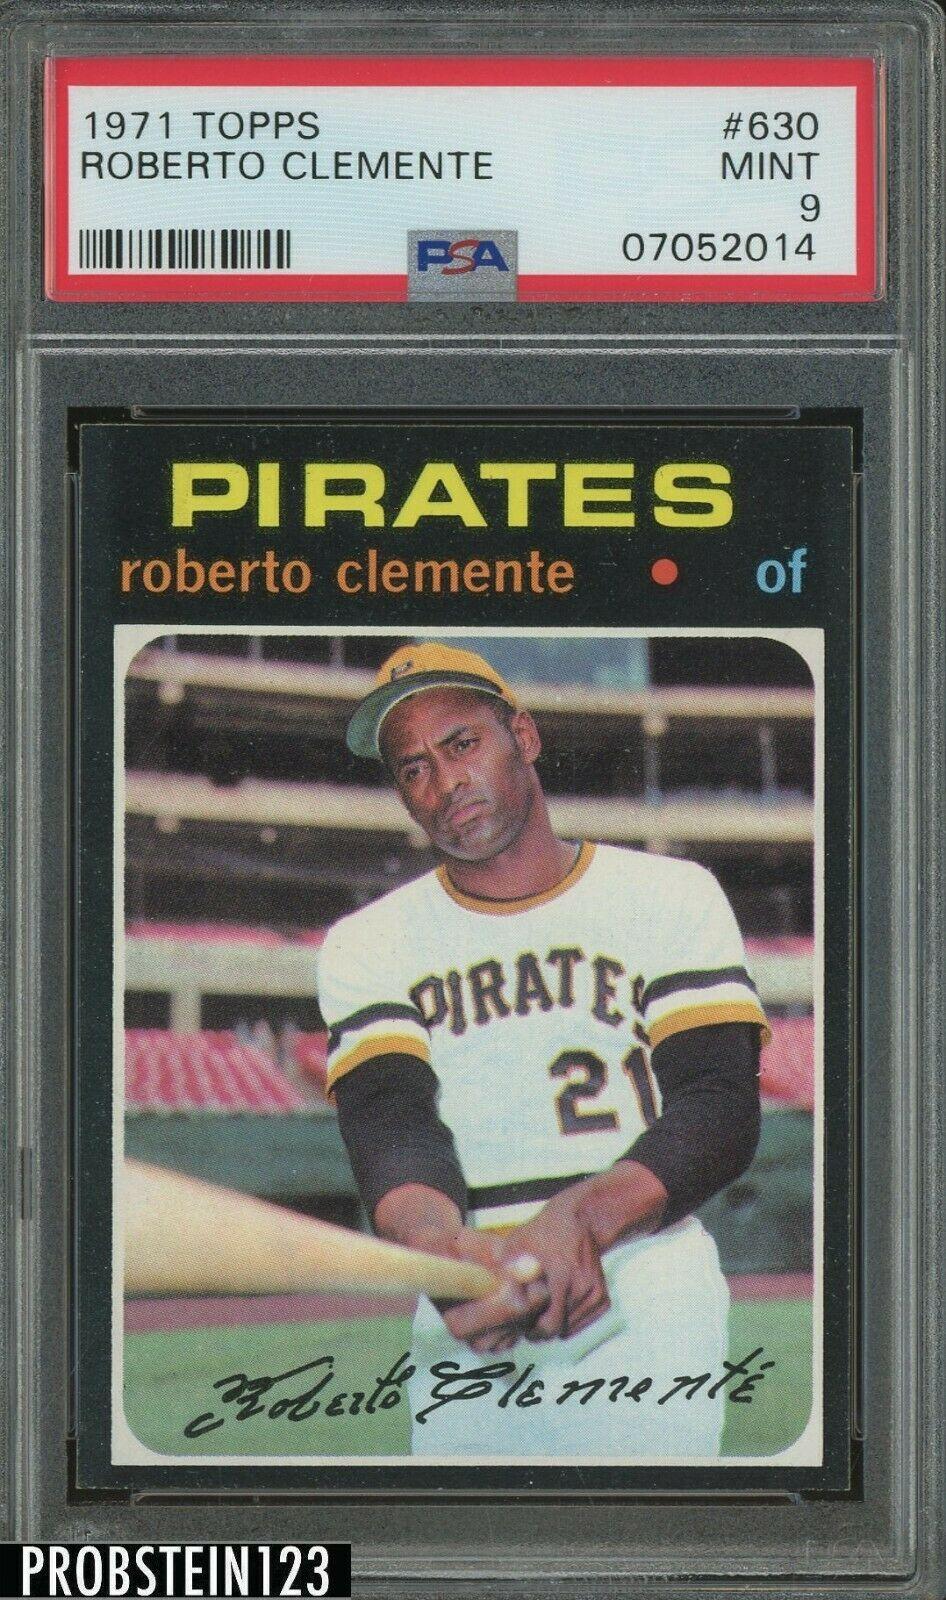 1971 Topps SETBREAK 630 Bob Roberto Clemente Pirates HOF PSA 9 MINT SUPER RARE